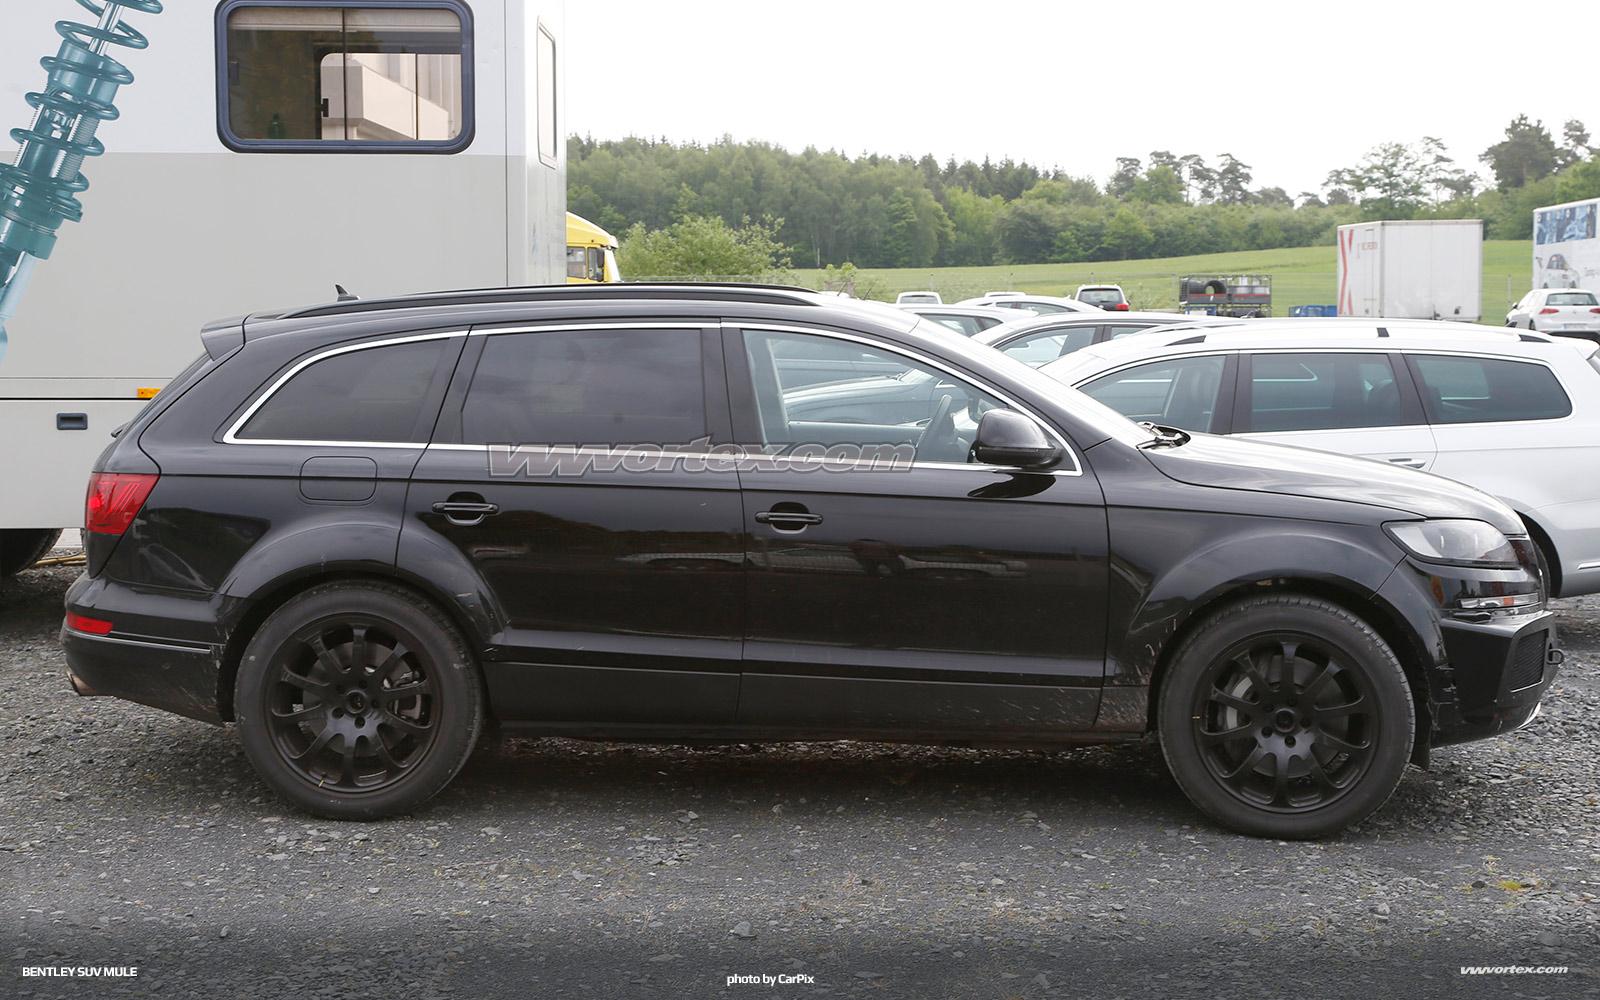 Audi S8 Talladega S MTM 579 110x60 photo